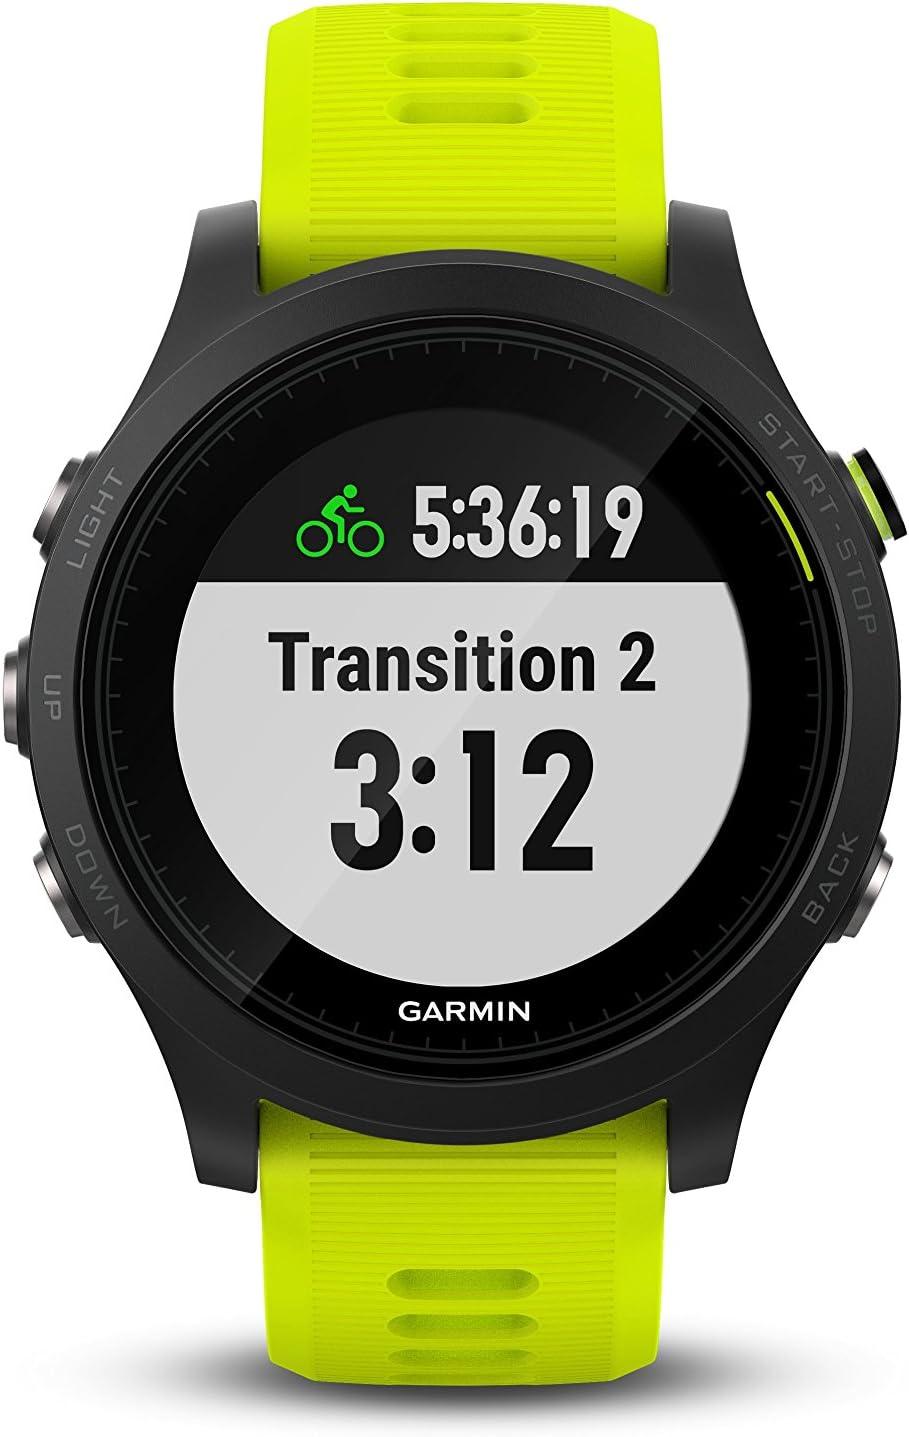 Garmin Forerunner 935-best watch for professional swimmers